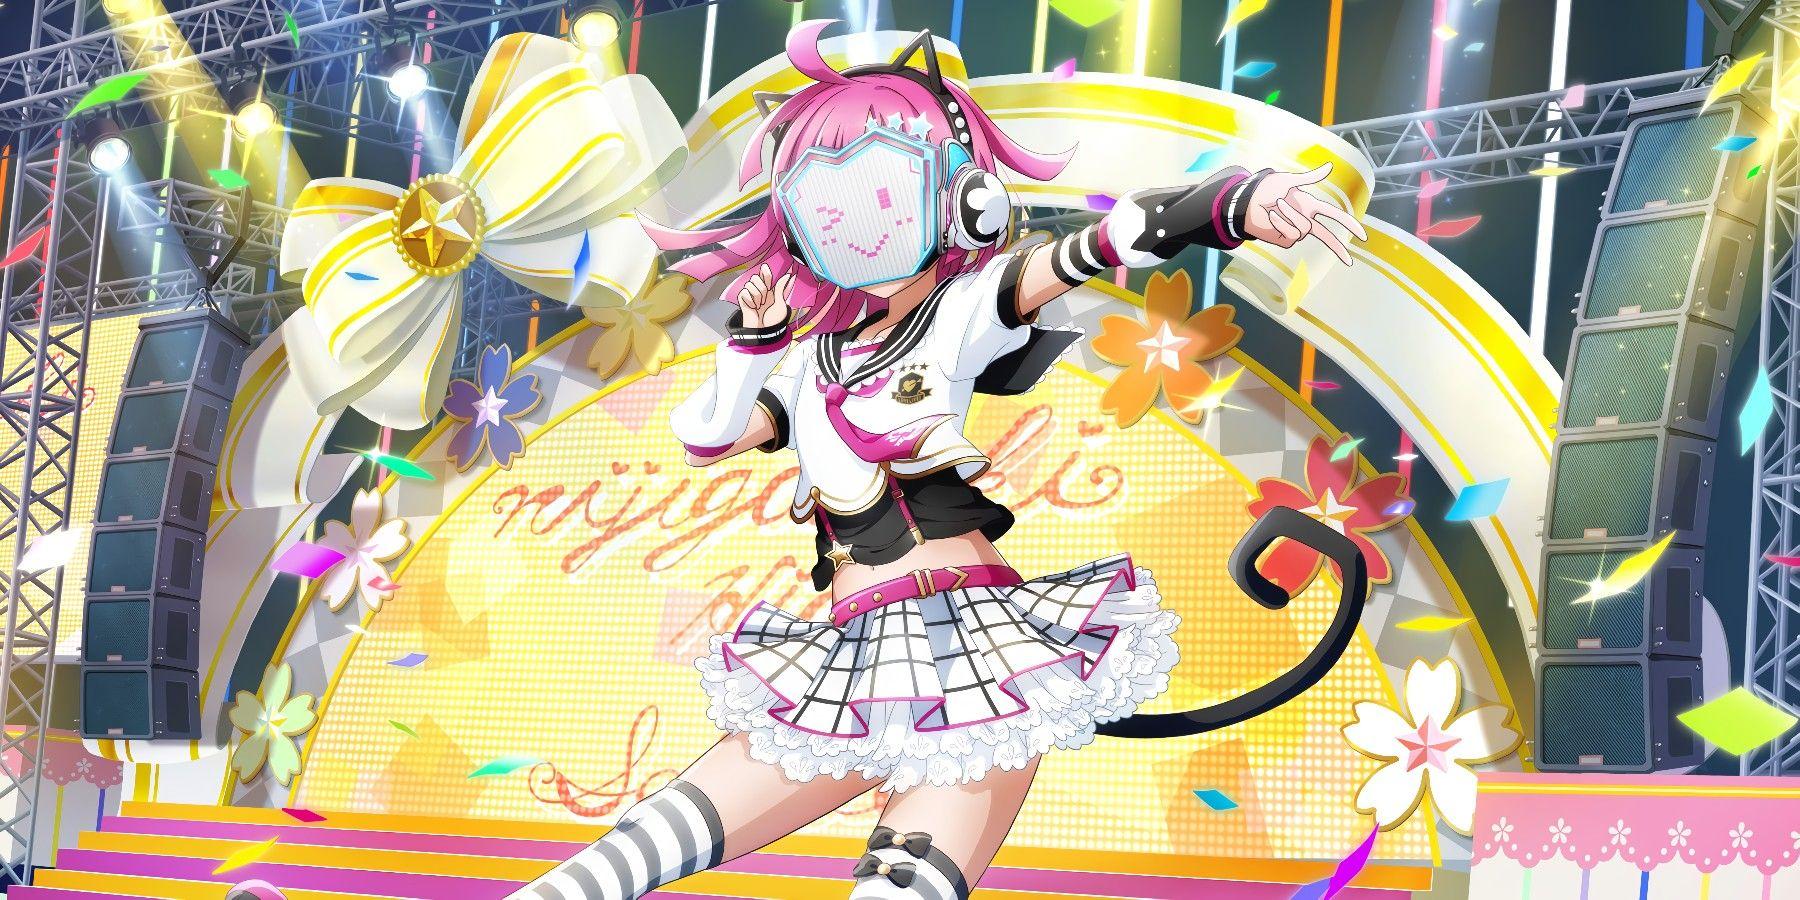 Pin By Melky Neko On Love Live All Stars Tennoji Rina Rina Tennoji Rina All star anime wallpaper